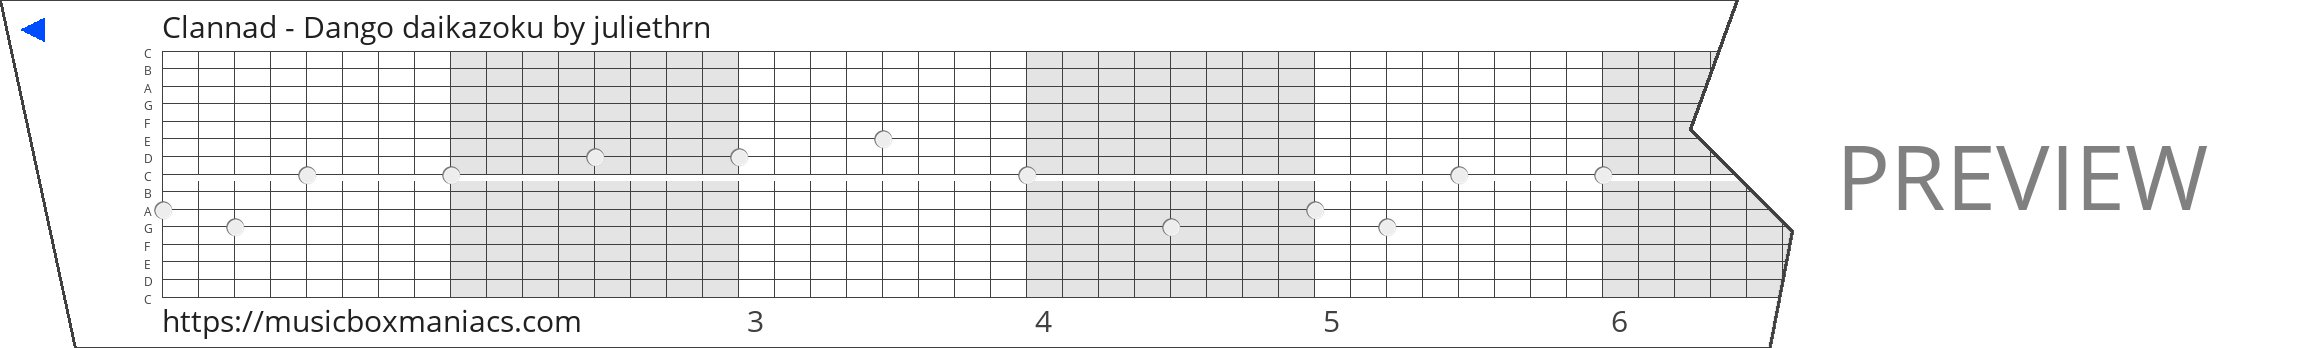 Clannad - Dango daikazoku 15 note music box paper strip